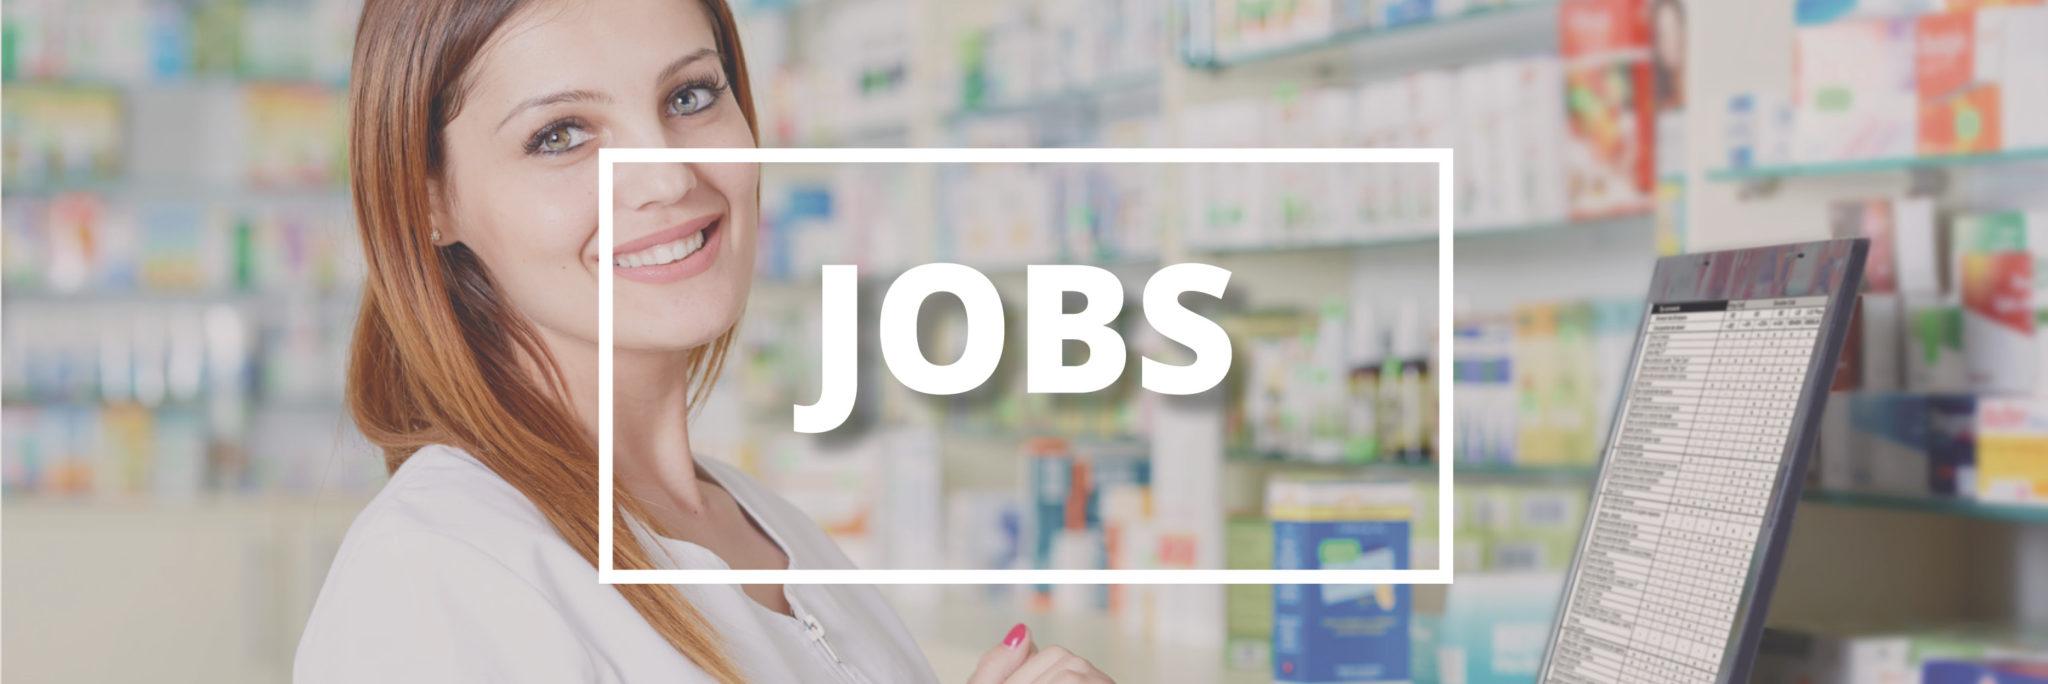 Jobs Ried-Apotheke